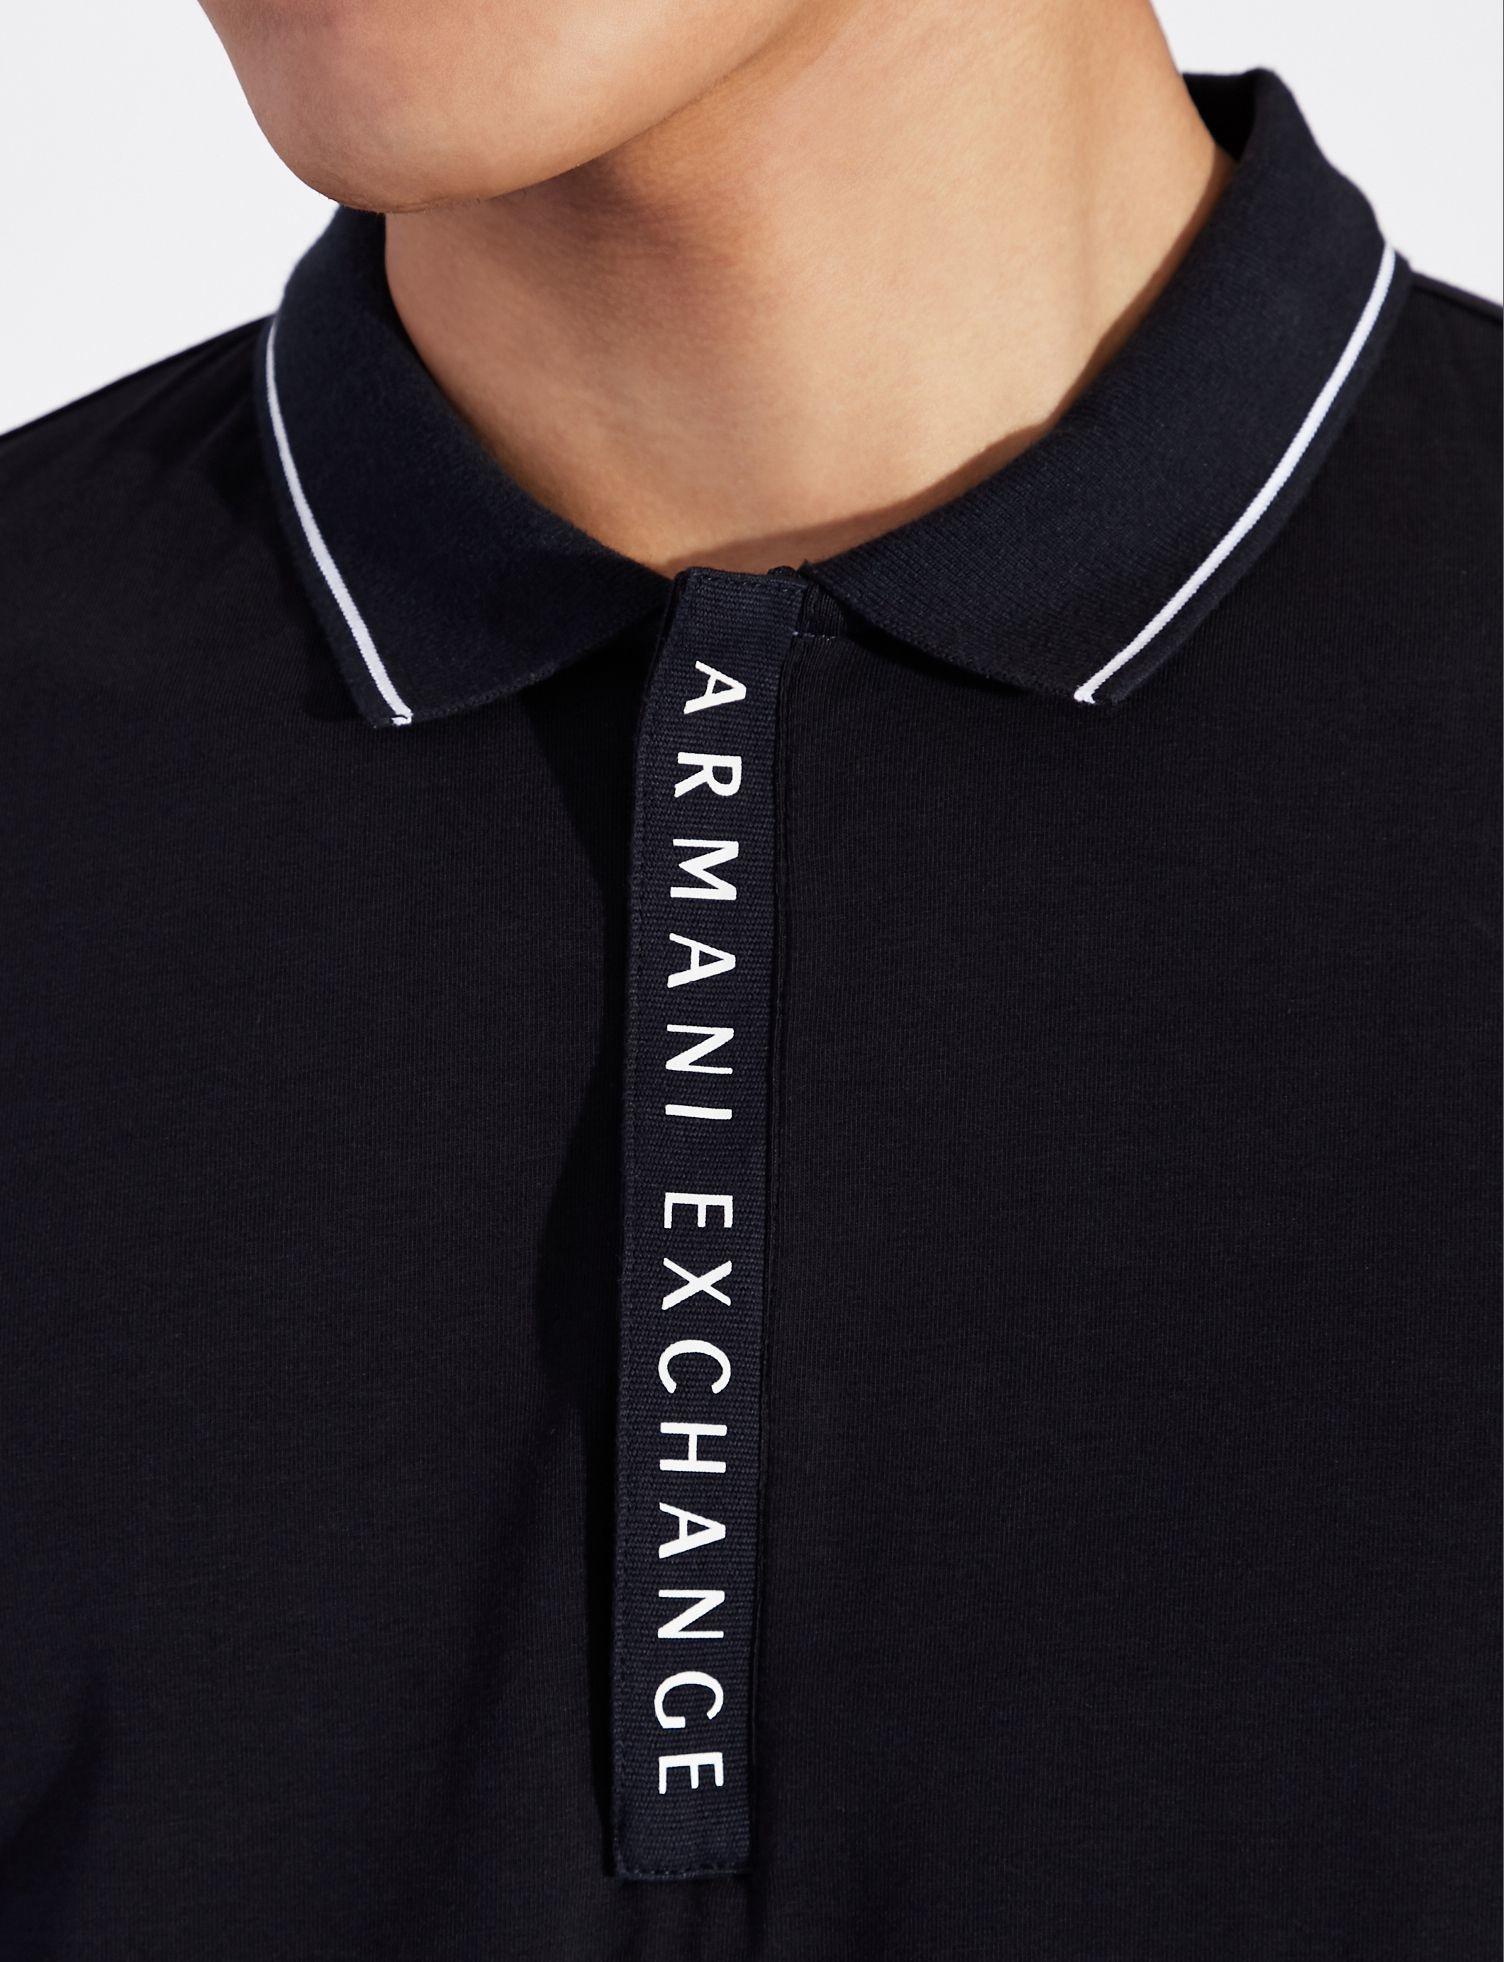 Armani Exchange Polo Armani Exchange 8NZF71-ZJH2Z-1510